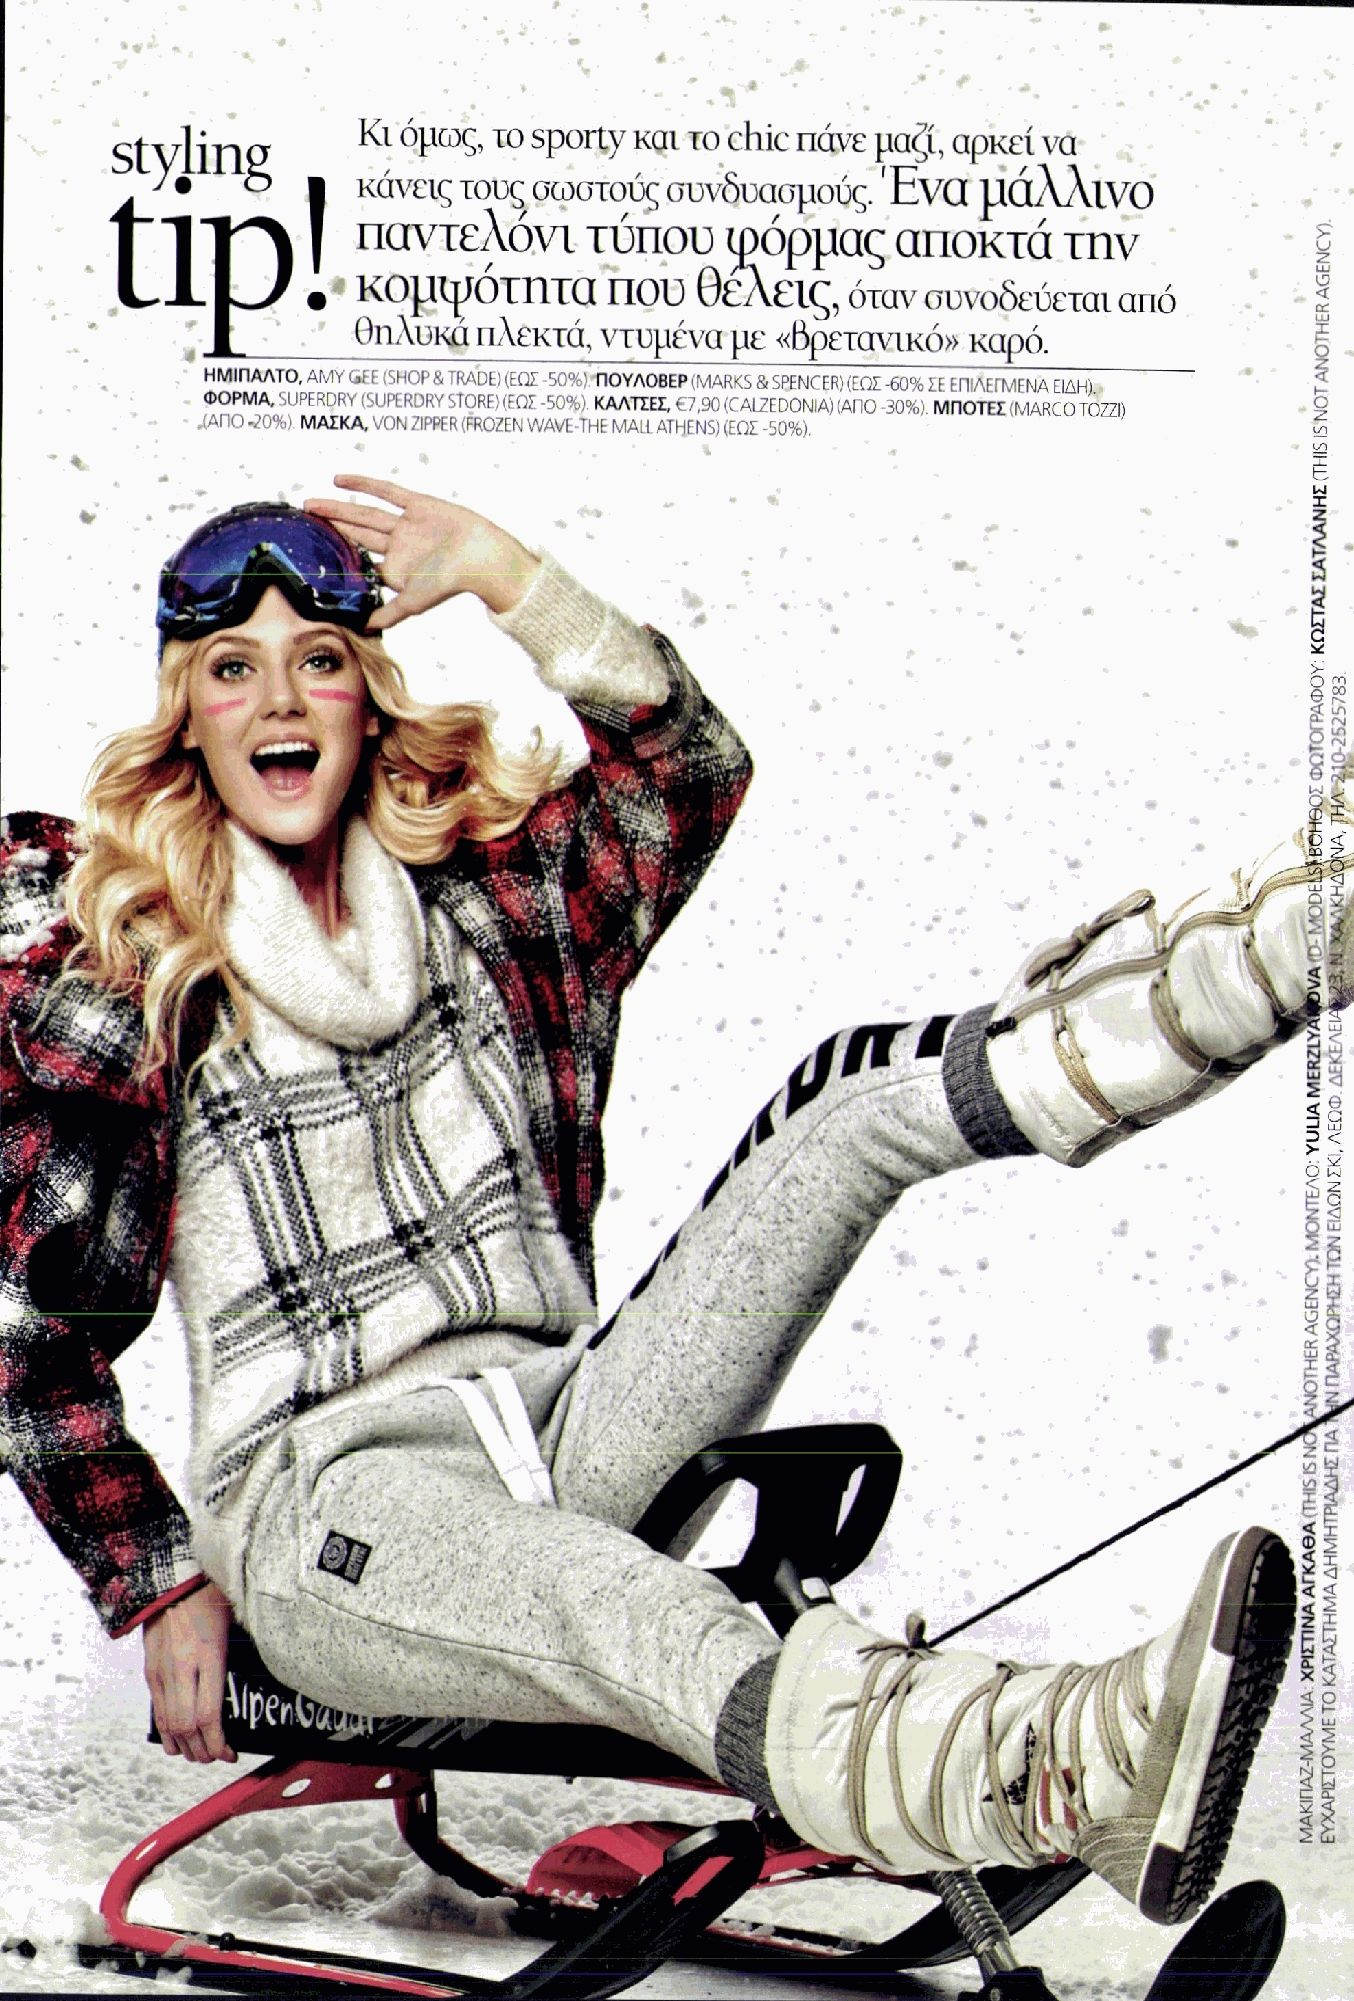 #MarcoTozzi #Apre #Ski #White #Boots #fashion #Women #Shoes